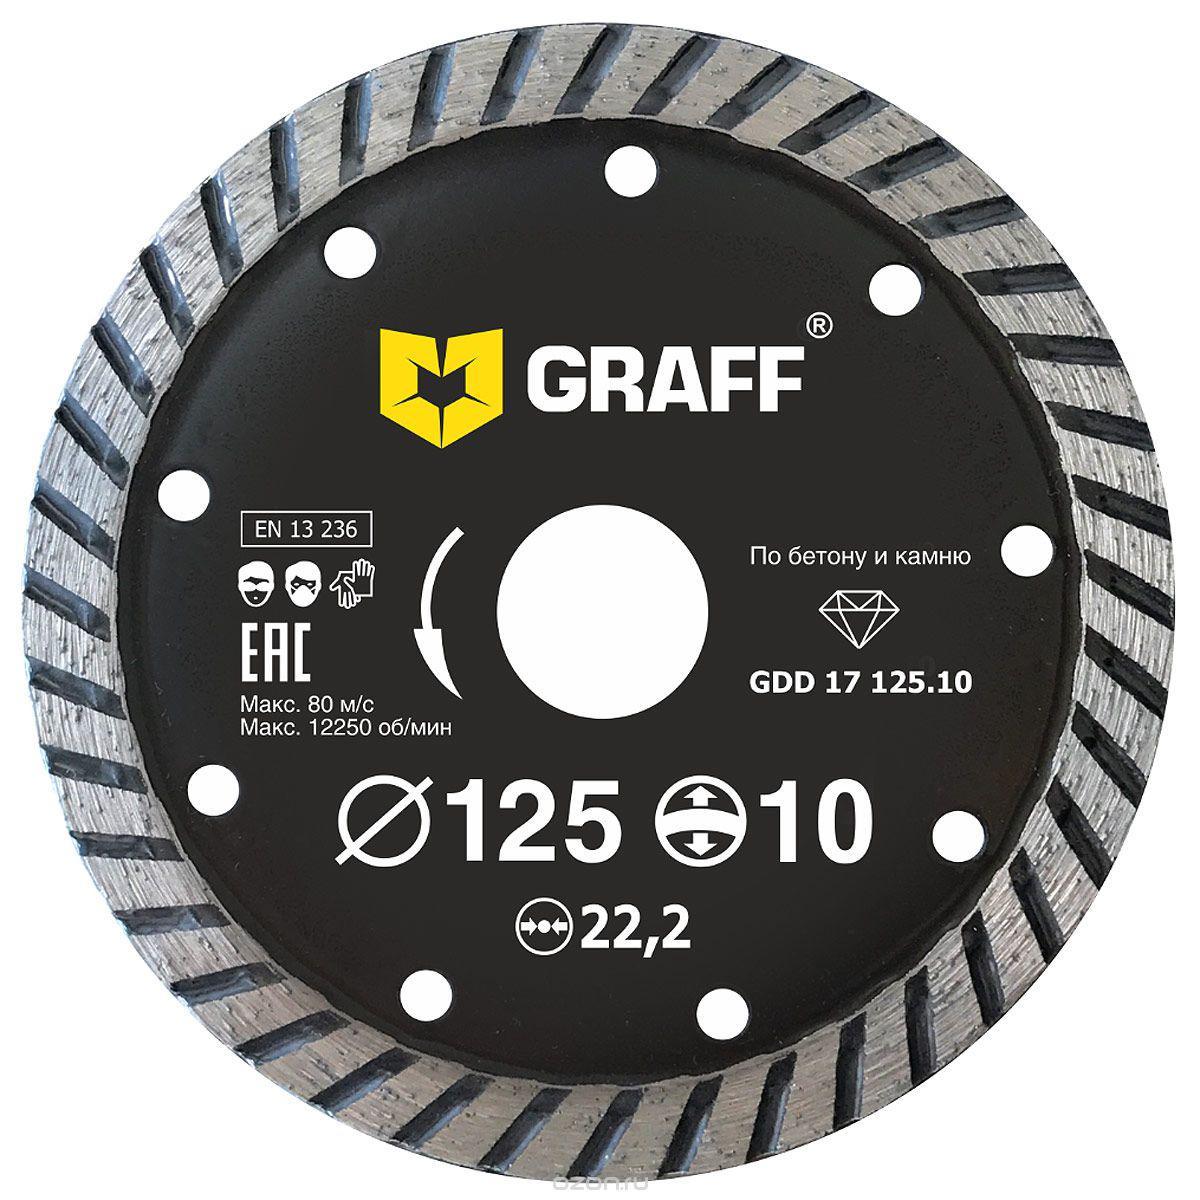 Круг алмазный Graff (gdd 17 125.10) Ф125х22мм по бетону цена и фото